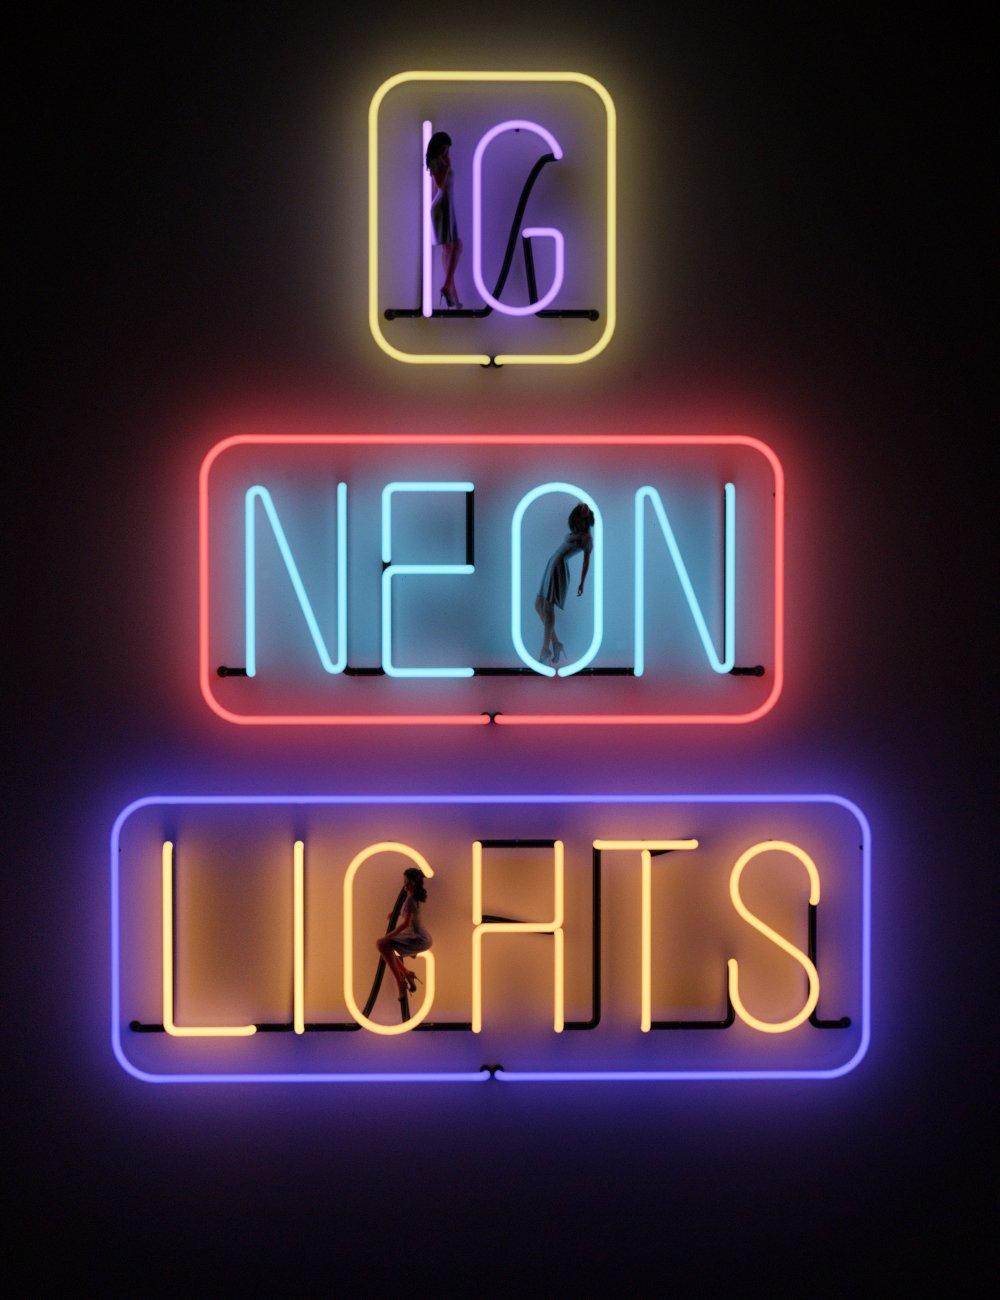 IG Iray Neon Lights by: IDG DesignsInaneGlory, 3D Models by Daz 3D